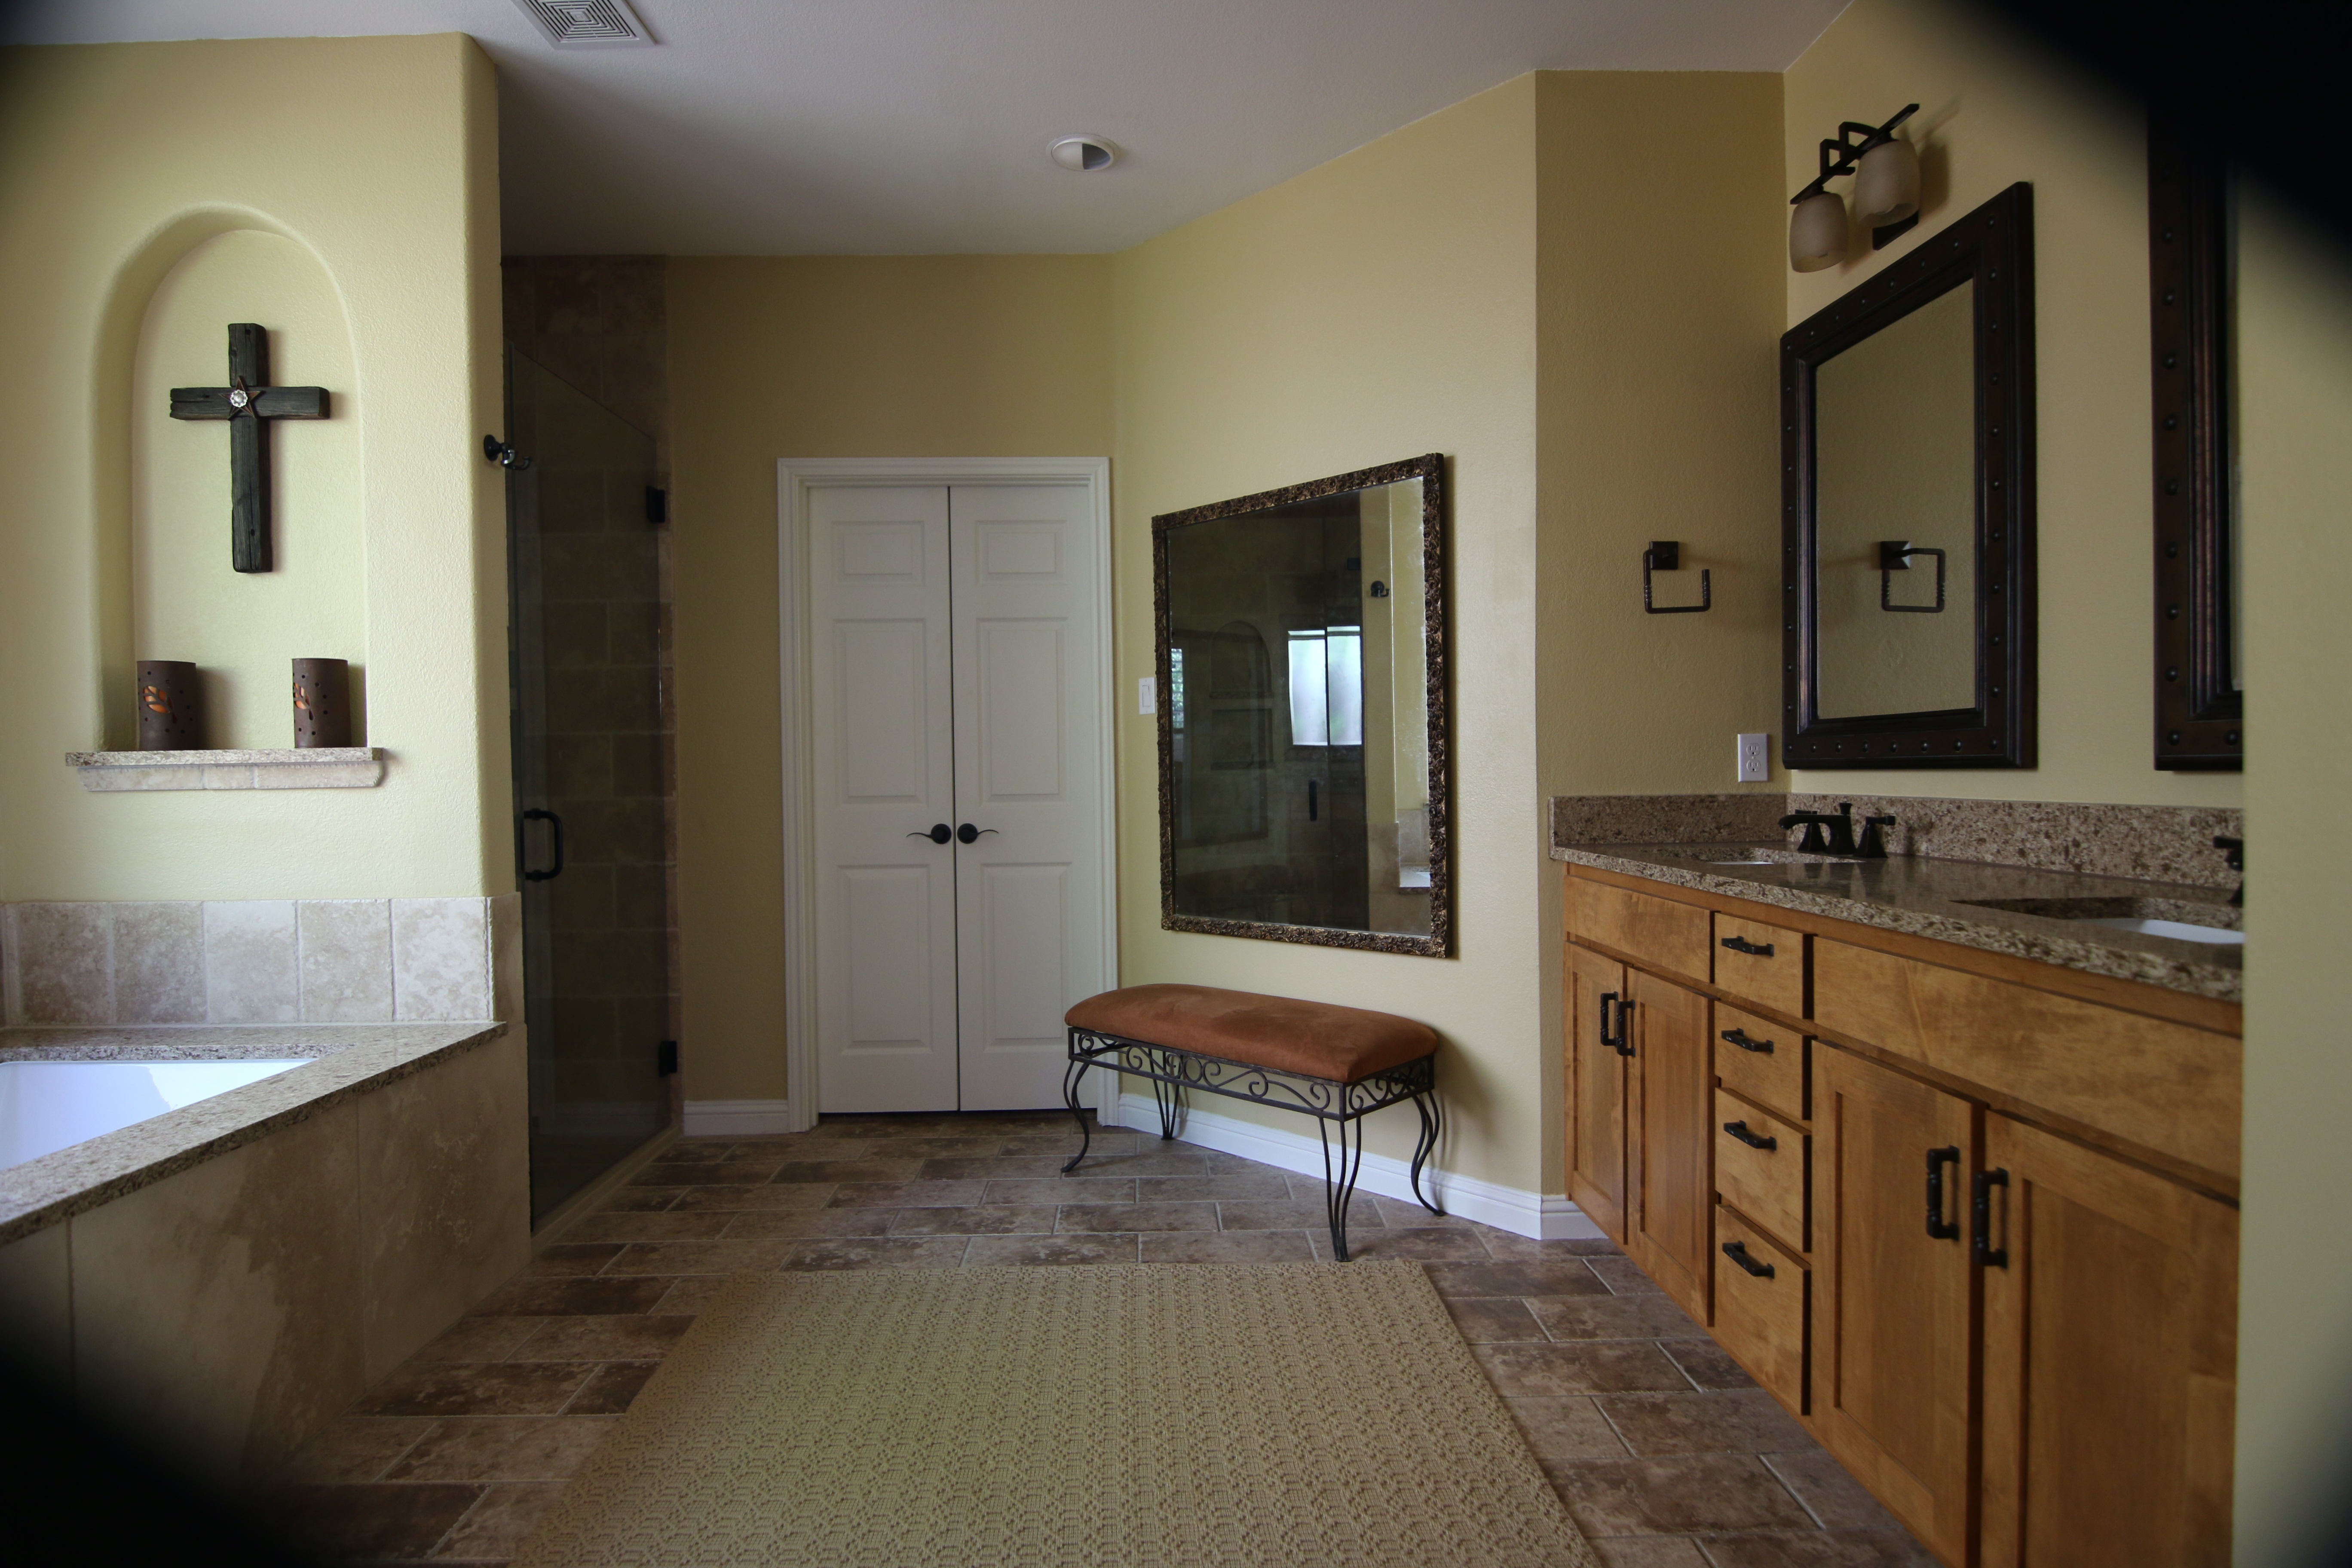 Bathroom Upgrades in Austin, Texas